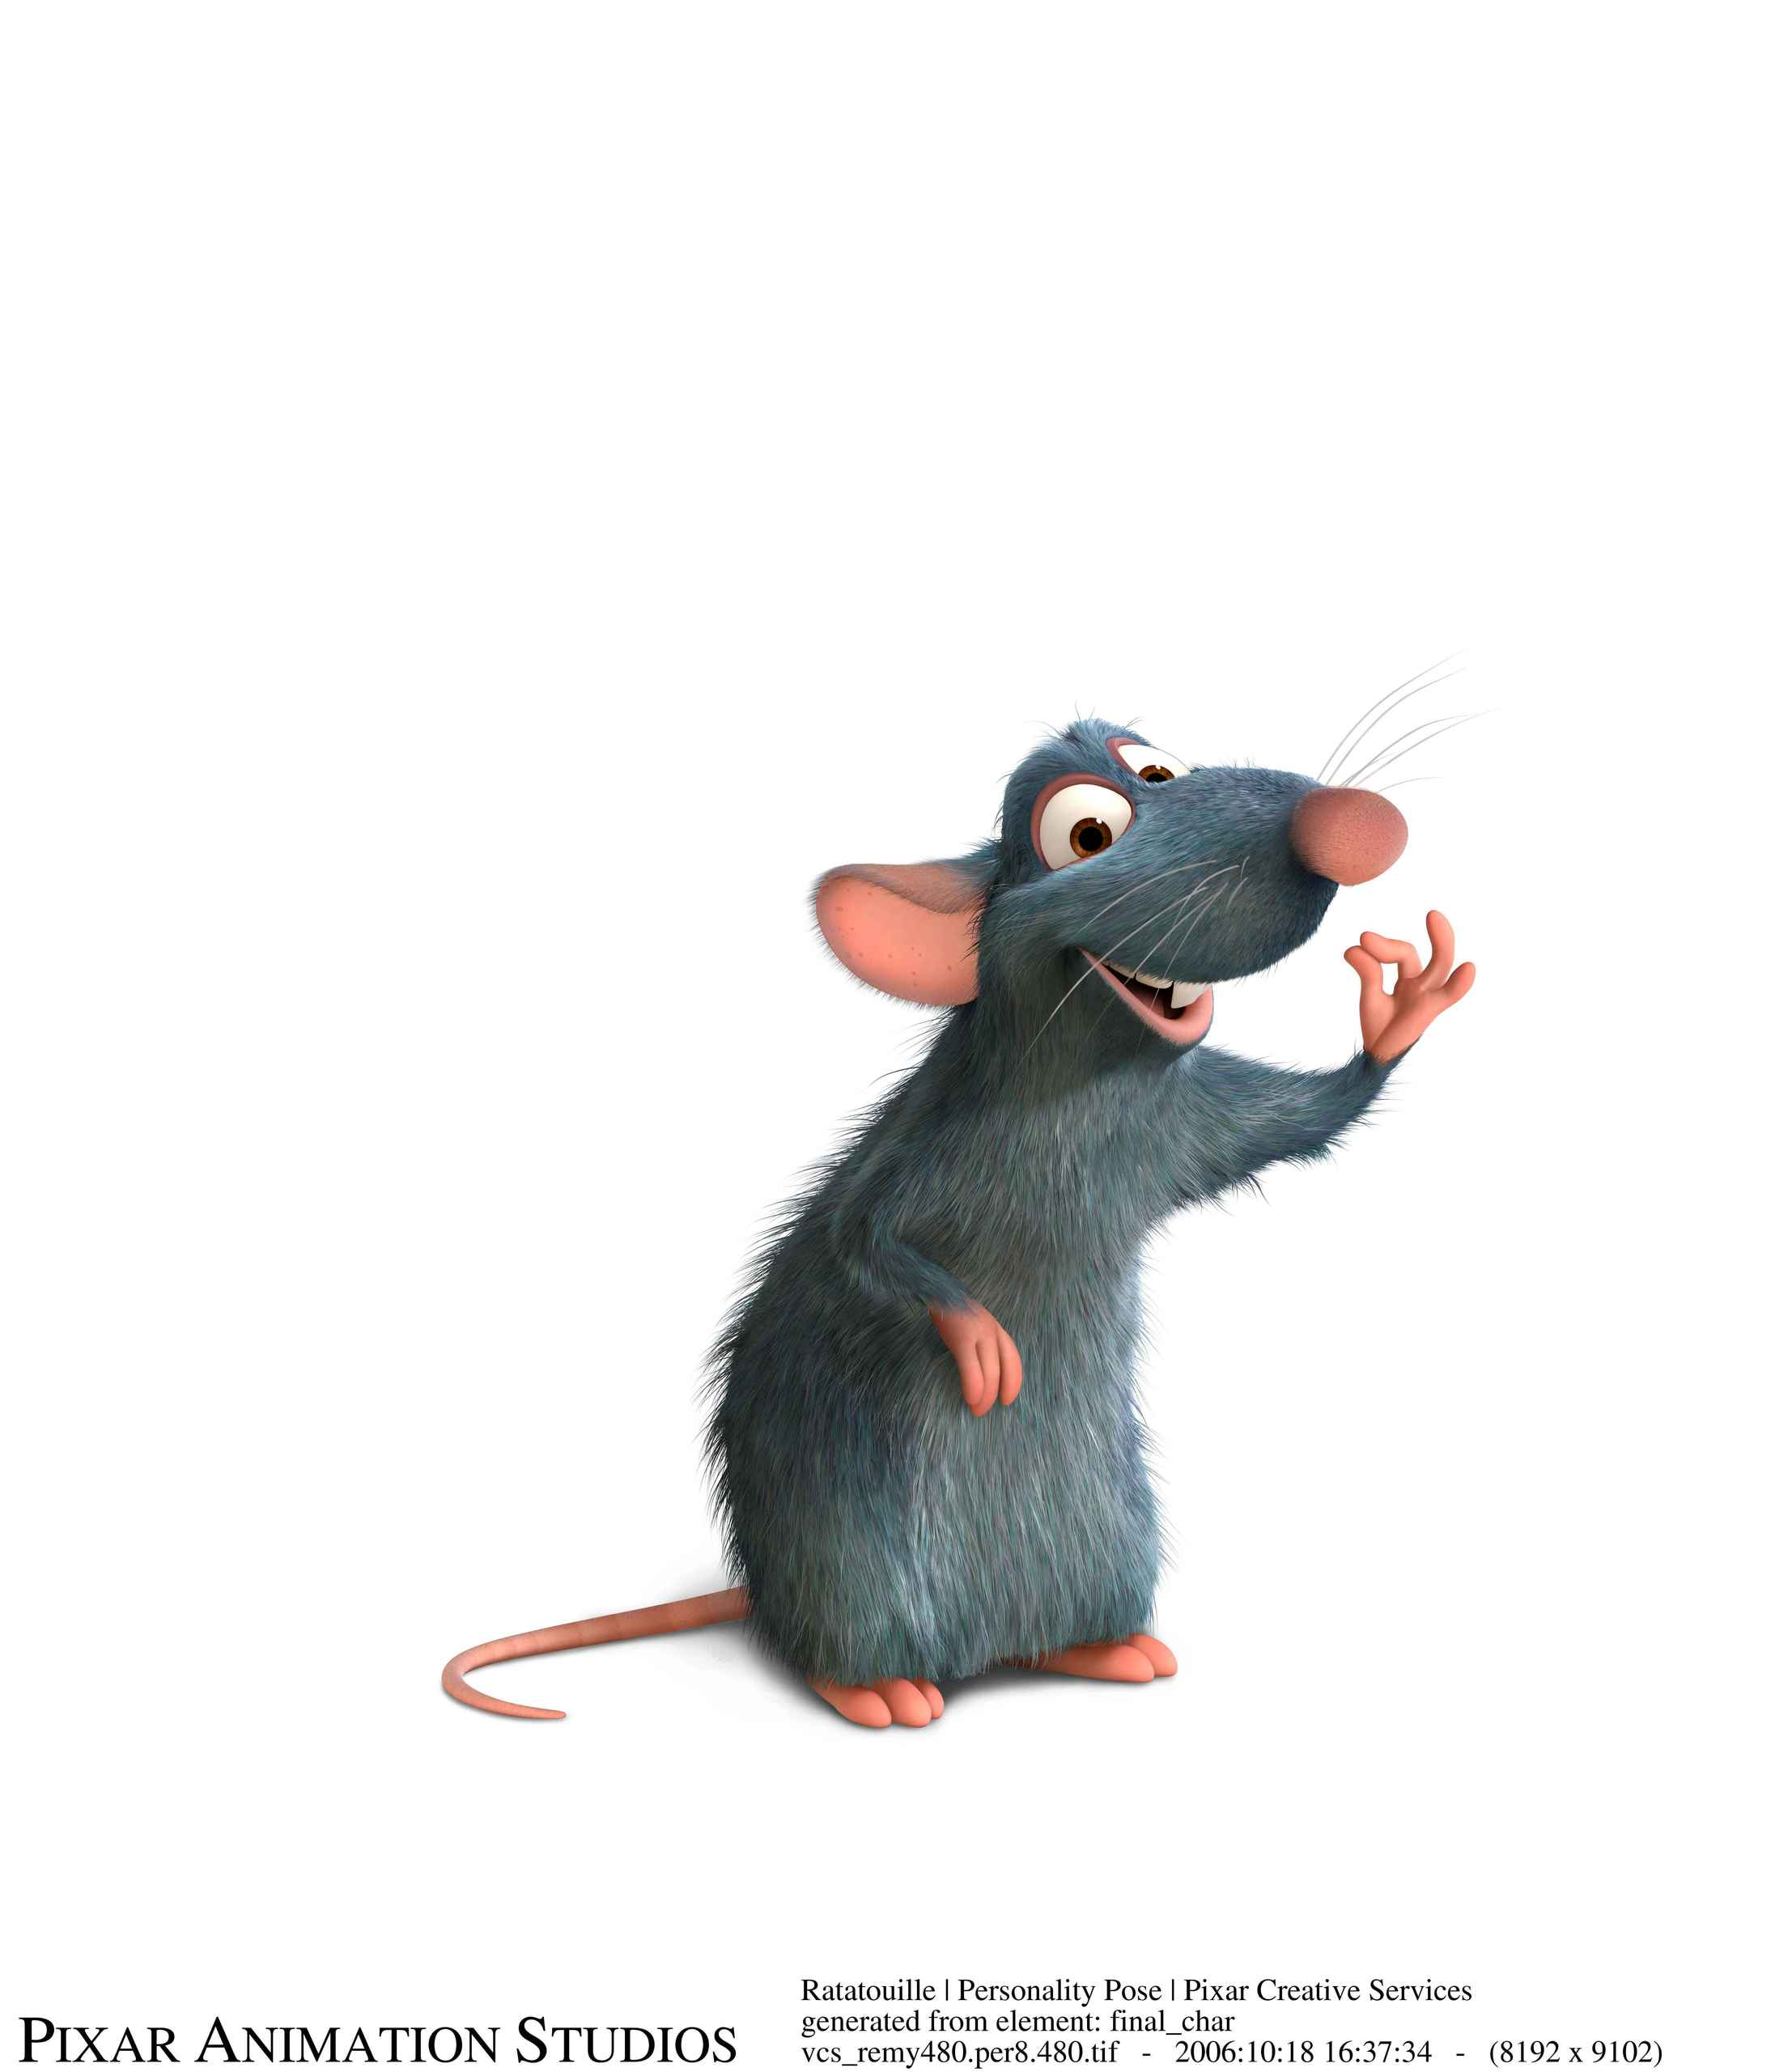 Www Wallpaper Com Free Download Hd Ratatouille Images Ratatouille Production Stills Hd